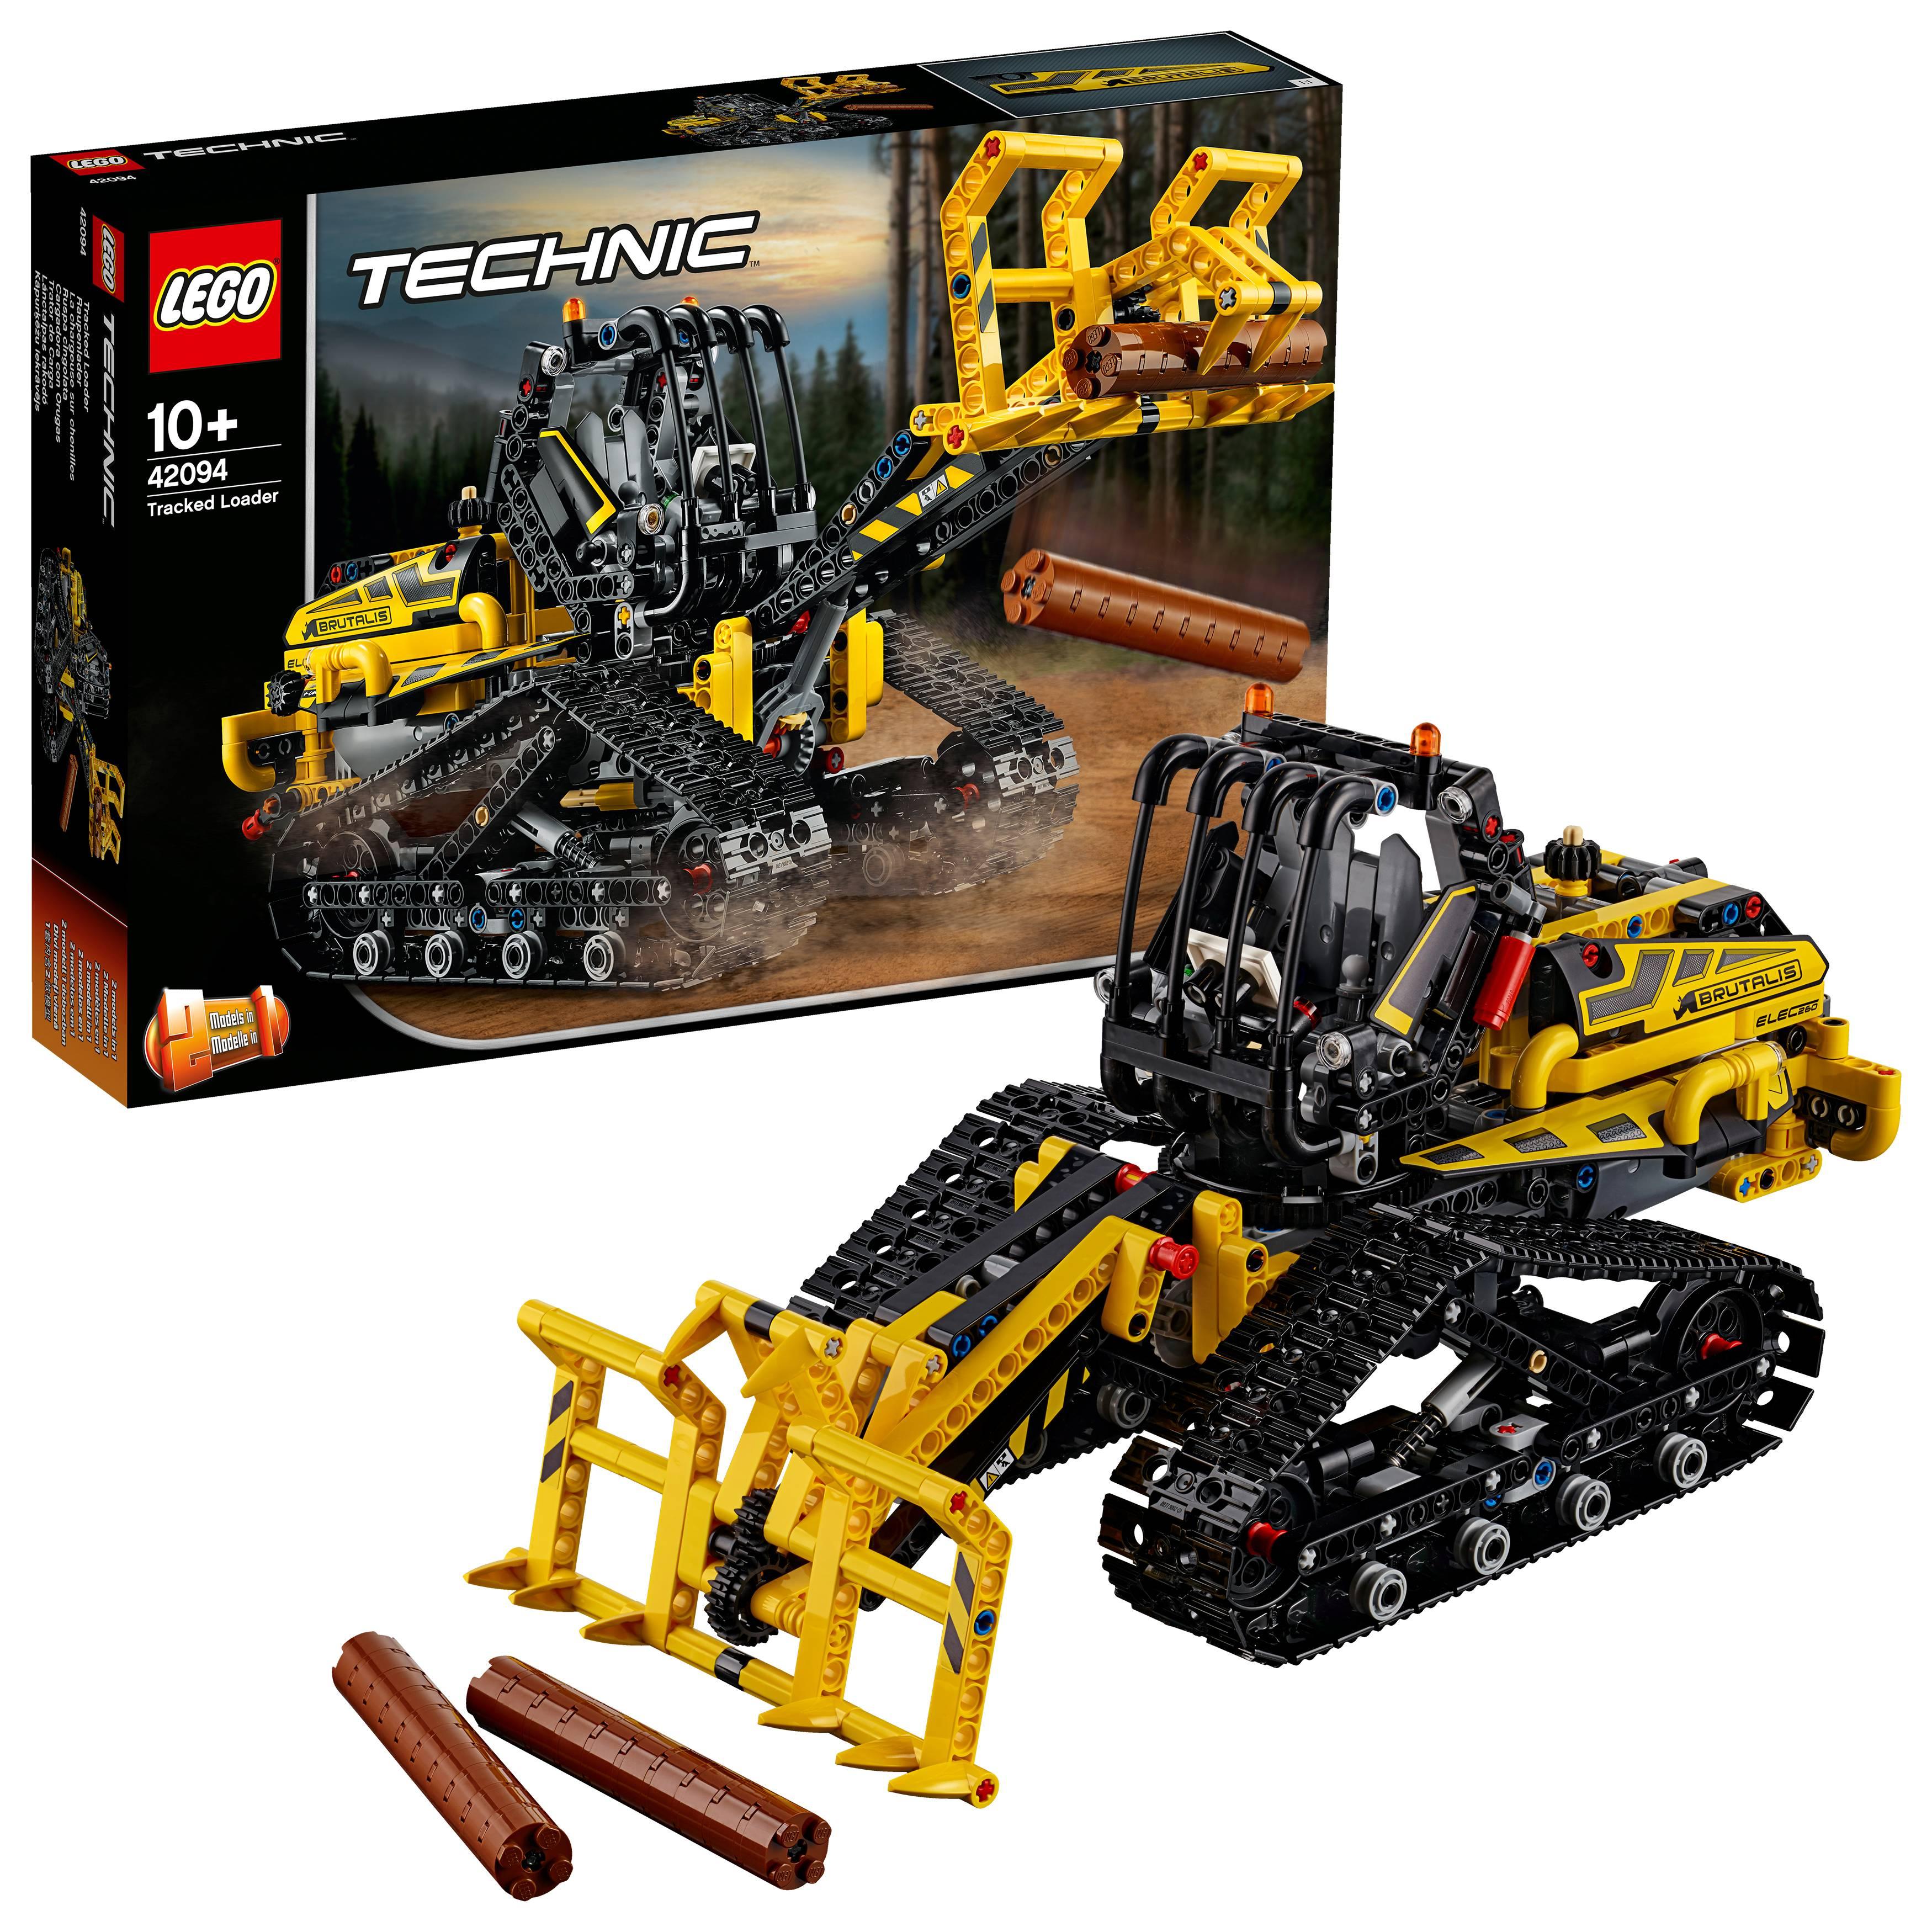 LEGO 42094 Technic Tracked Loader £39.99 (using ebay code) @ thebiggesttoystore / eBay